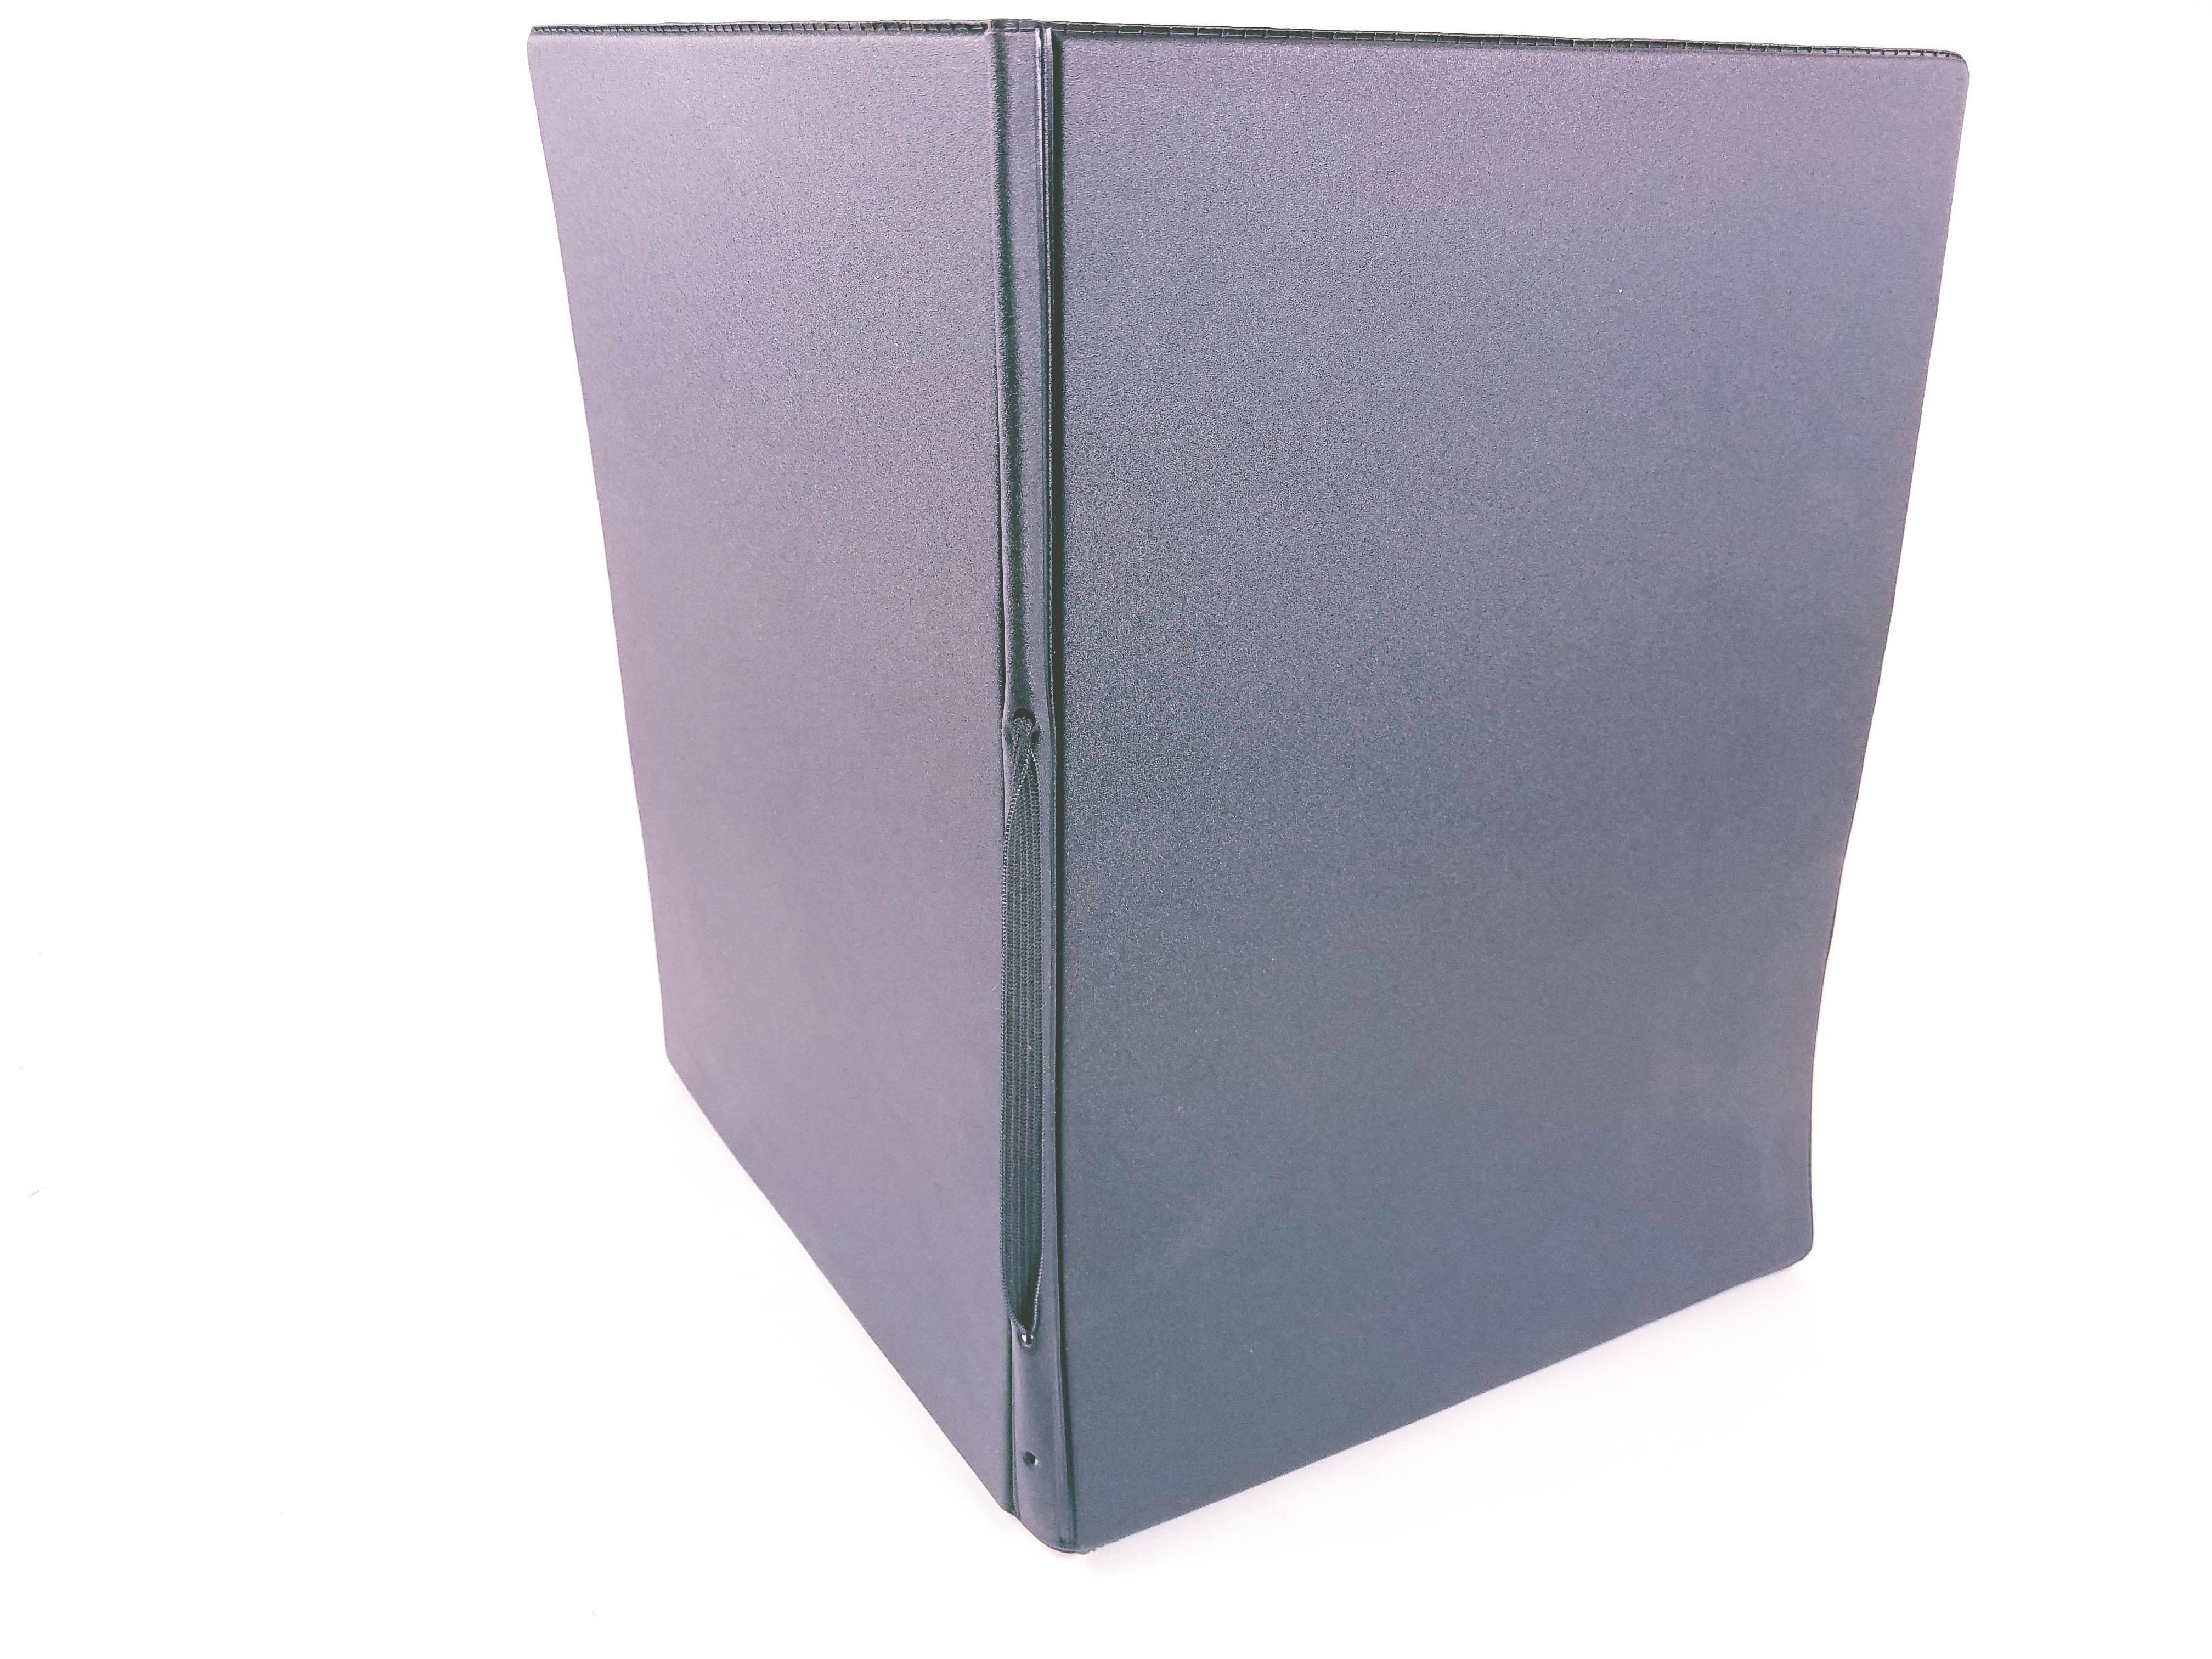 Manhasset 1600 Manhasset Choral Folder